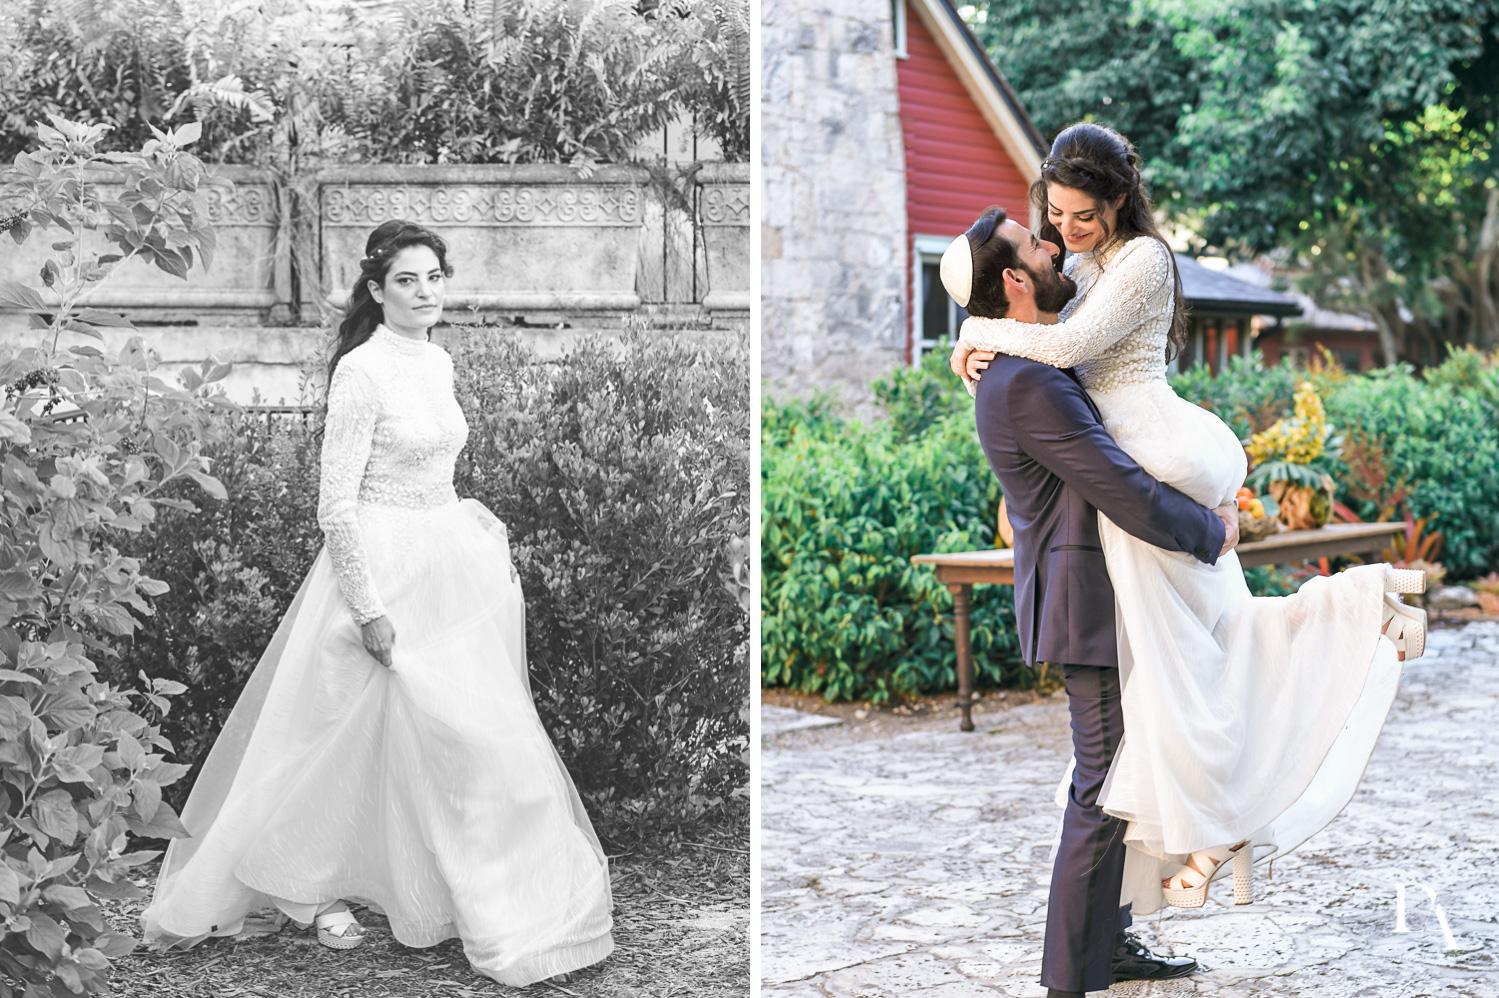 fun portraits at Traditional Jewish Wedding at Deering Estate Miami by Domino Arts Photography